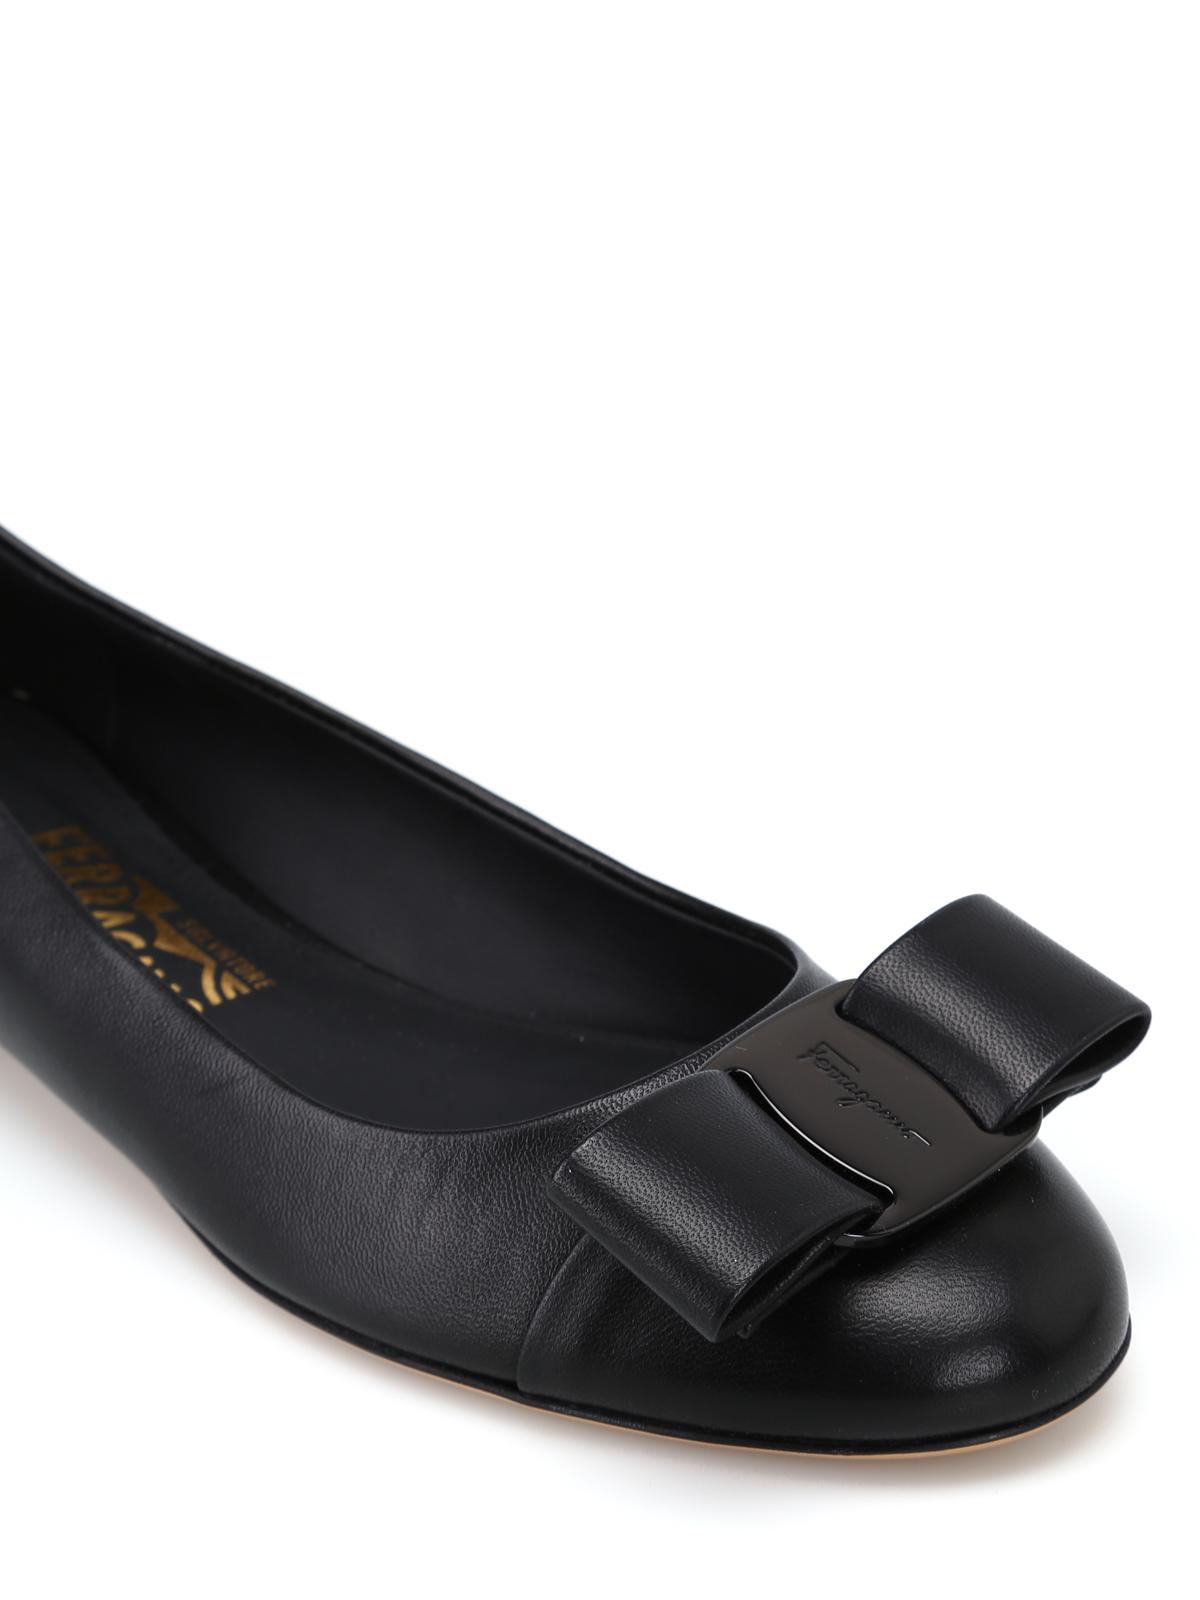 leather flats - flat shoes